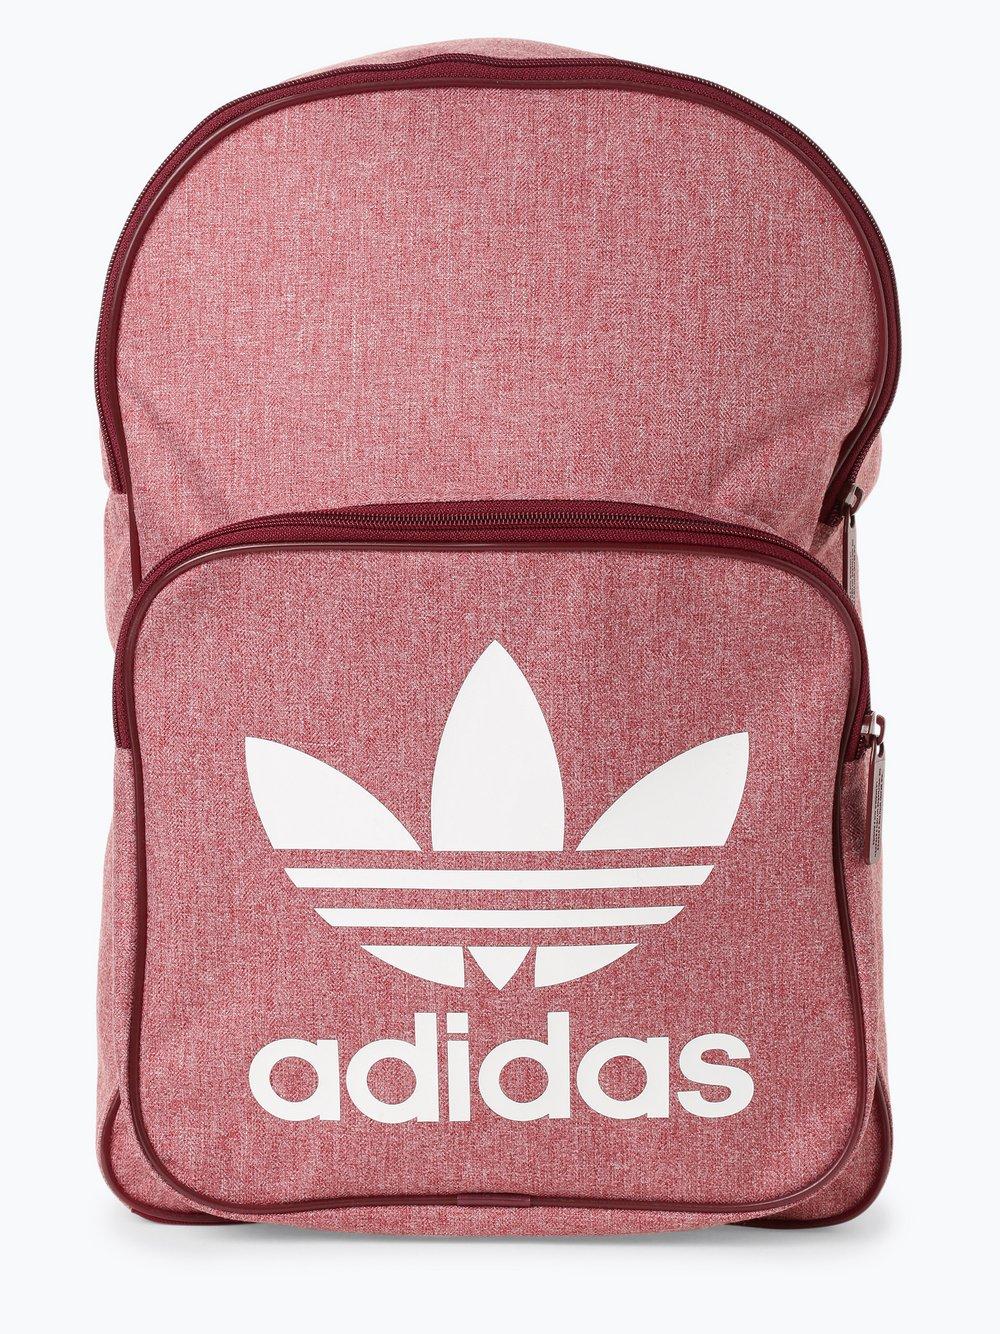 przedstawianie kupuj bestsellery sprzedaż obuwia adidas Originals Plecak damski kup online   VANGRAAF.COM